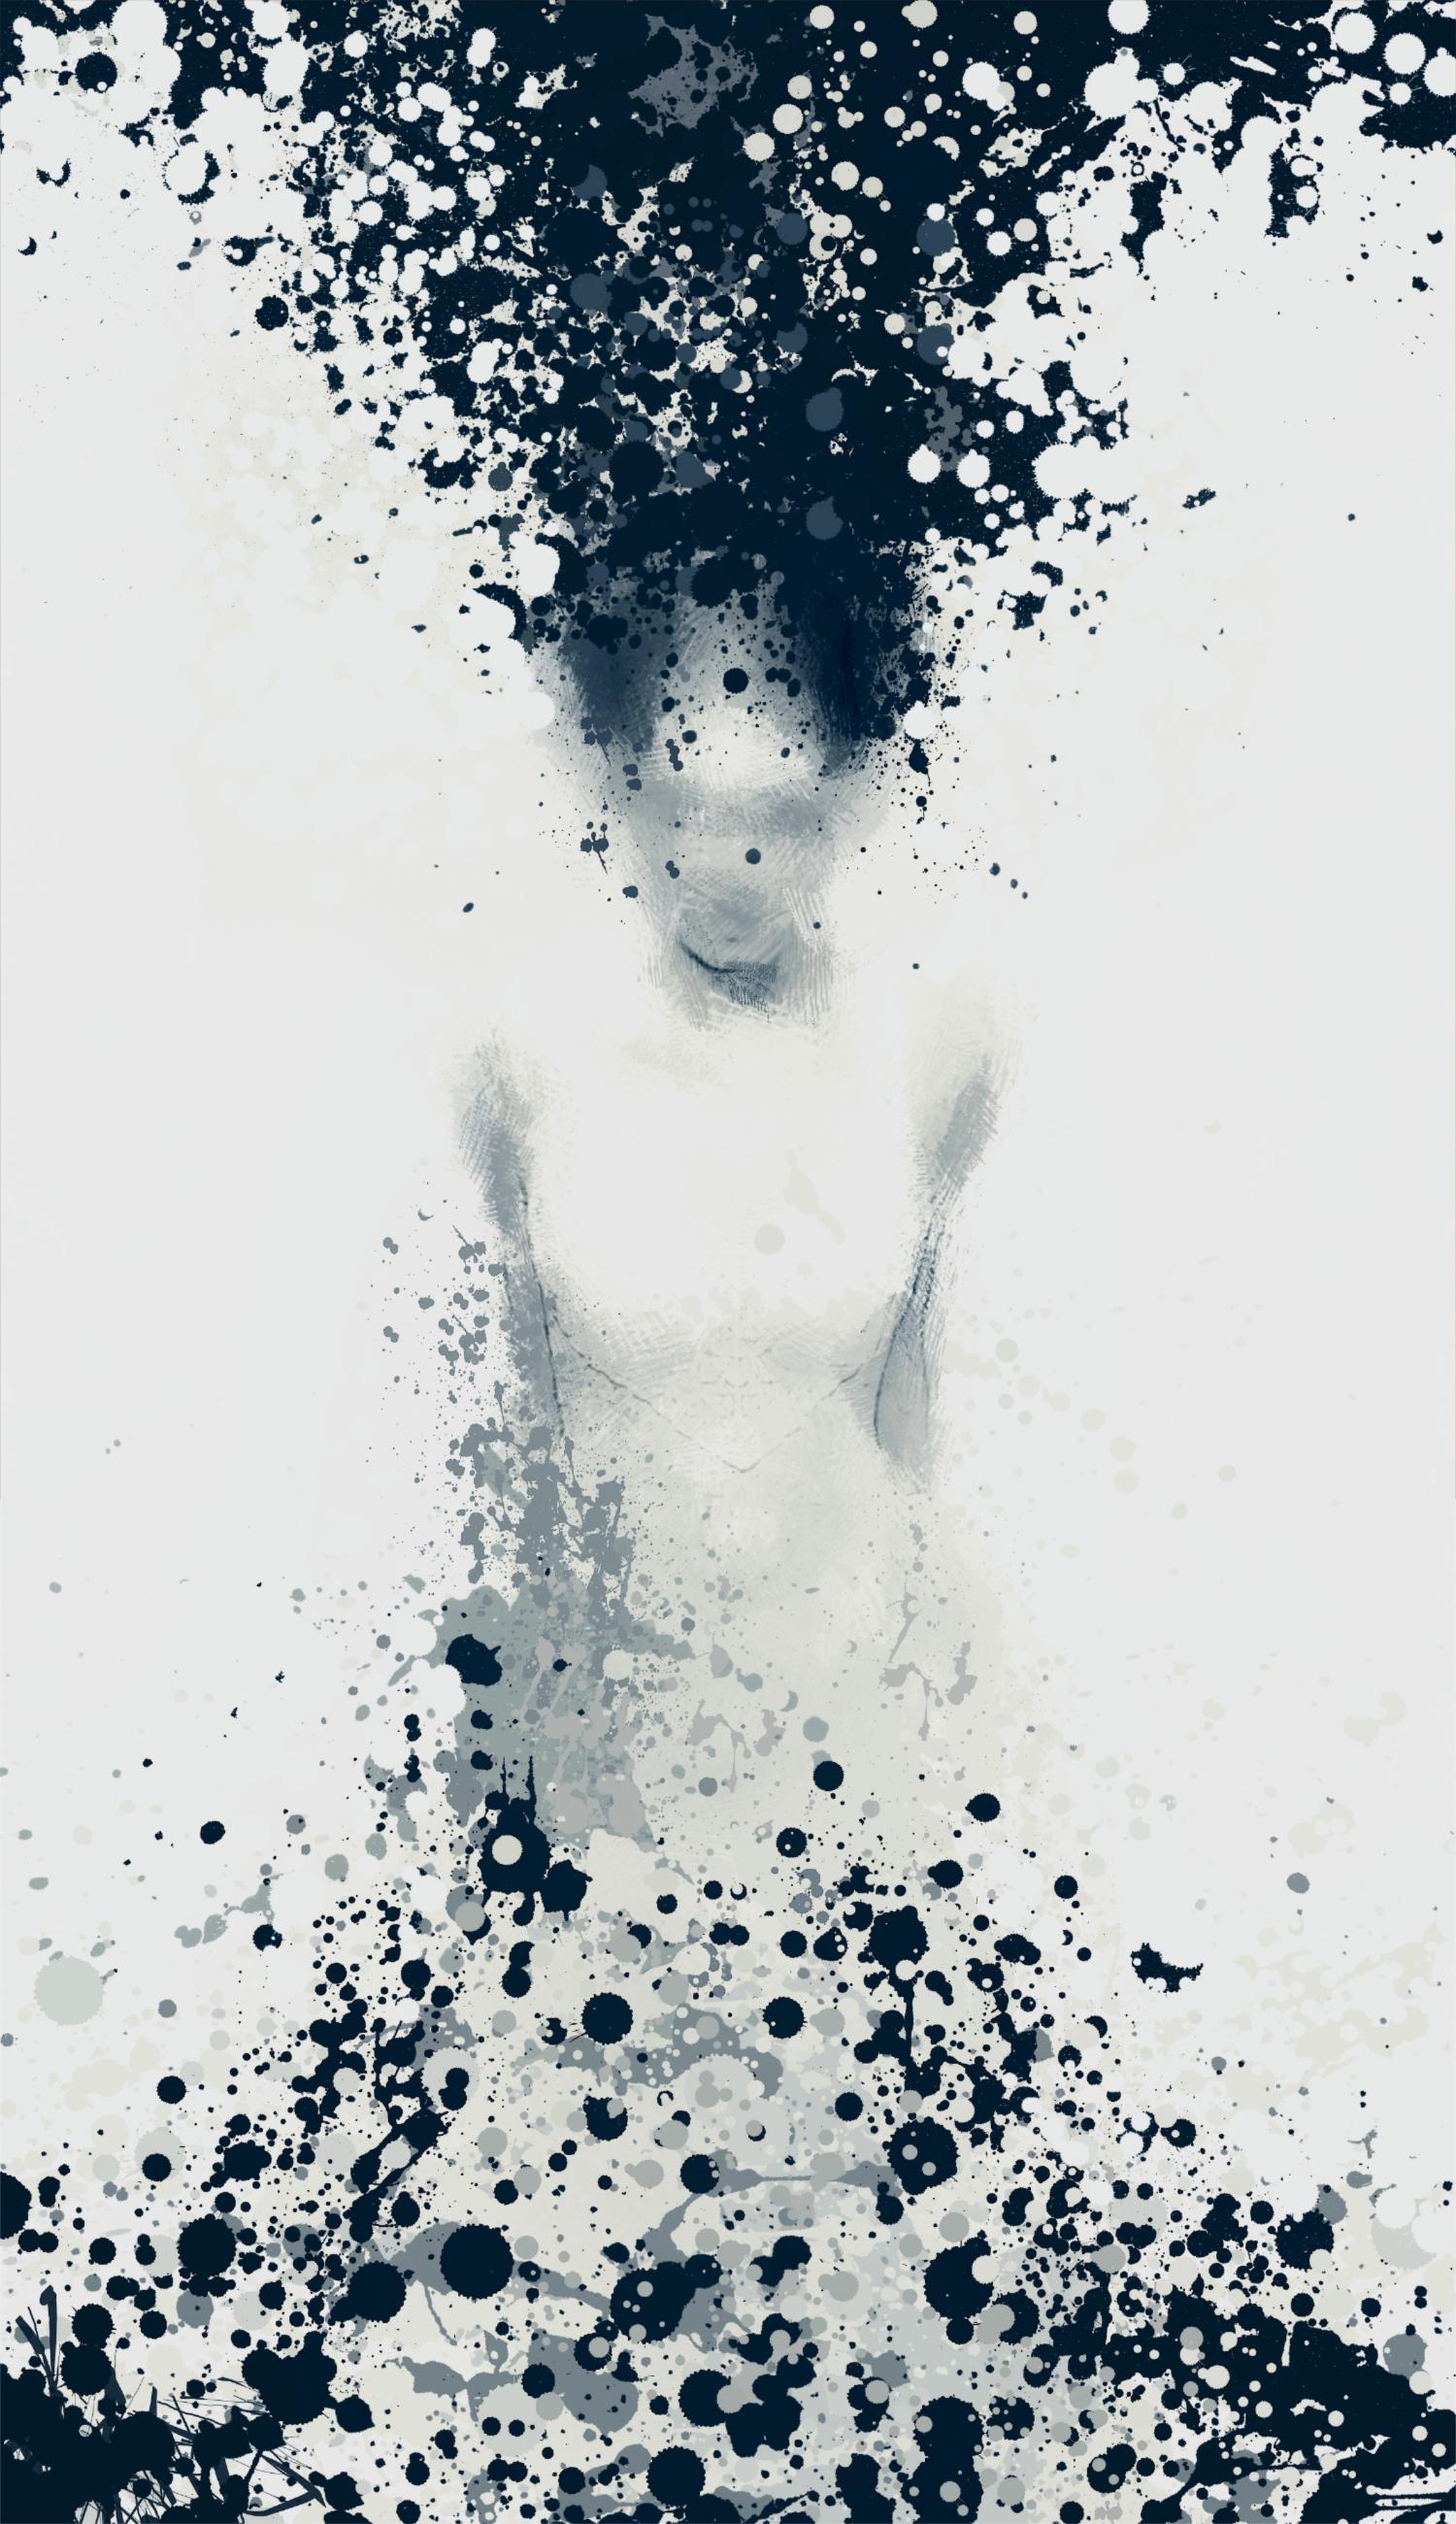 _ghostIV